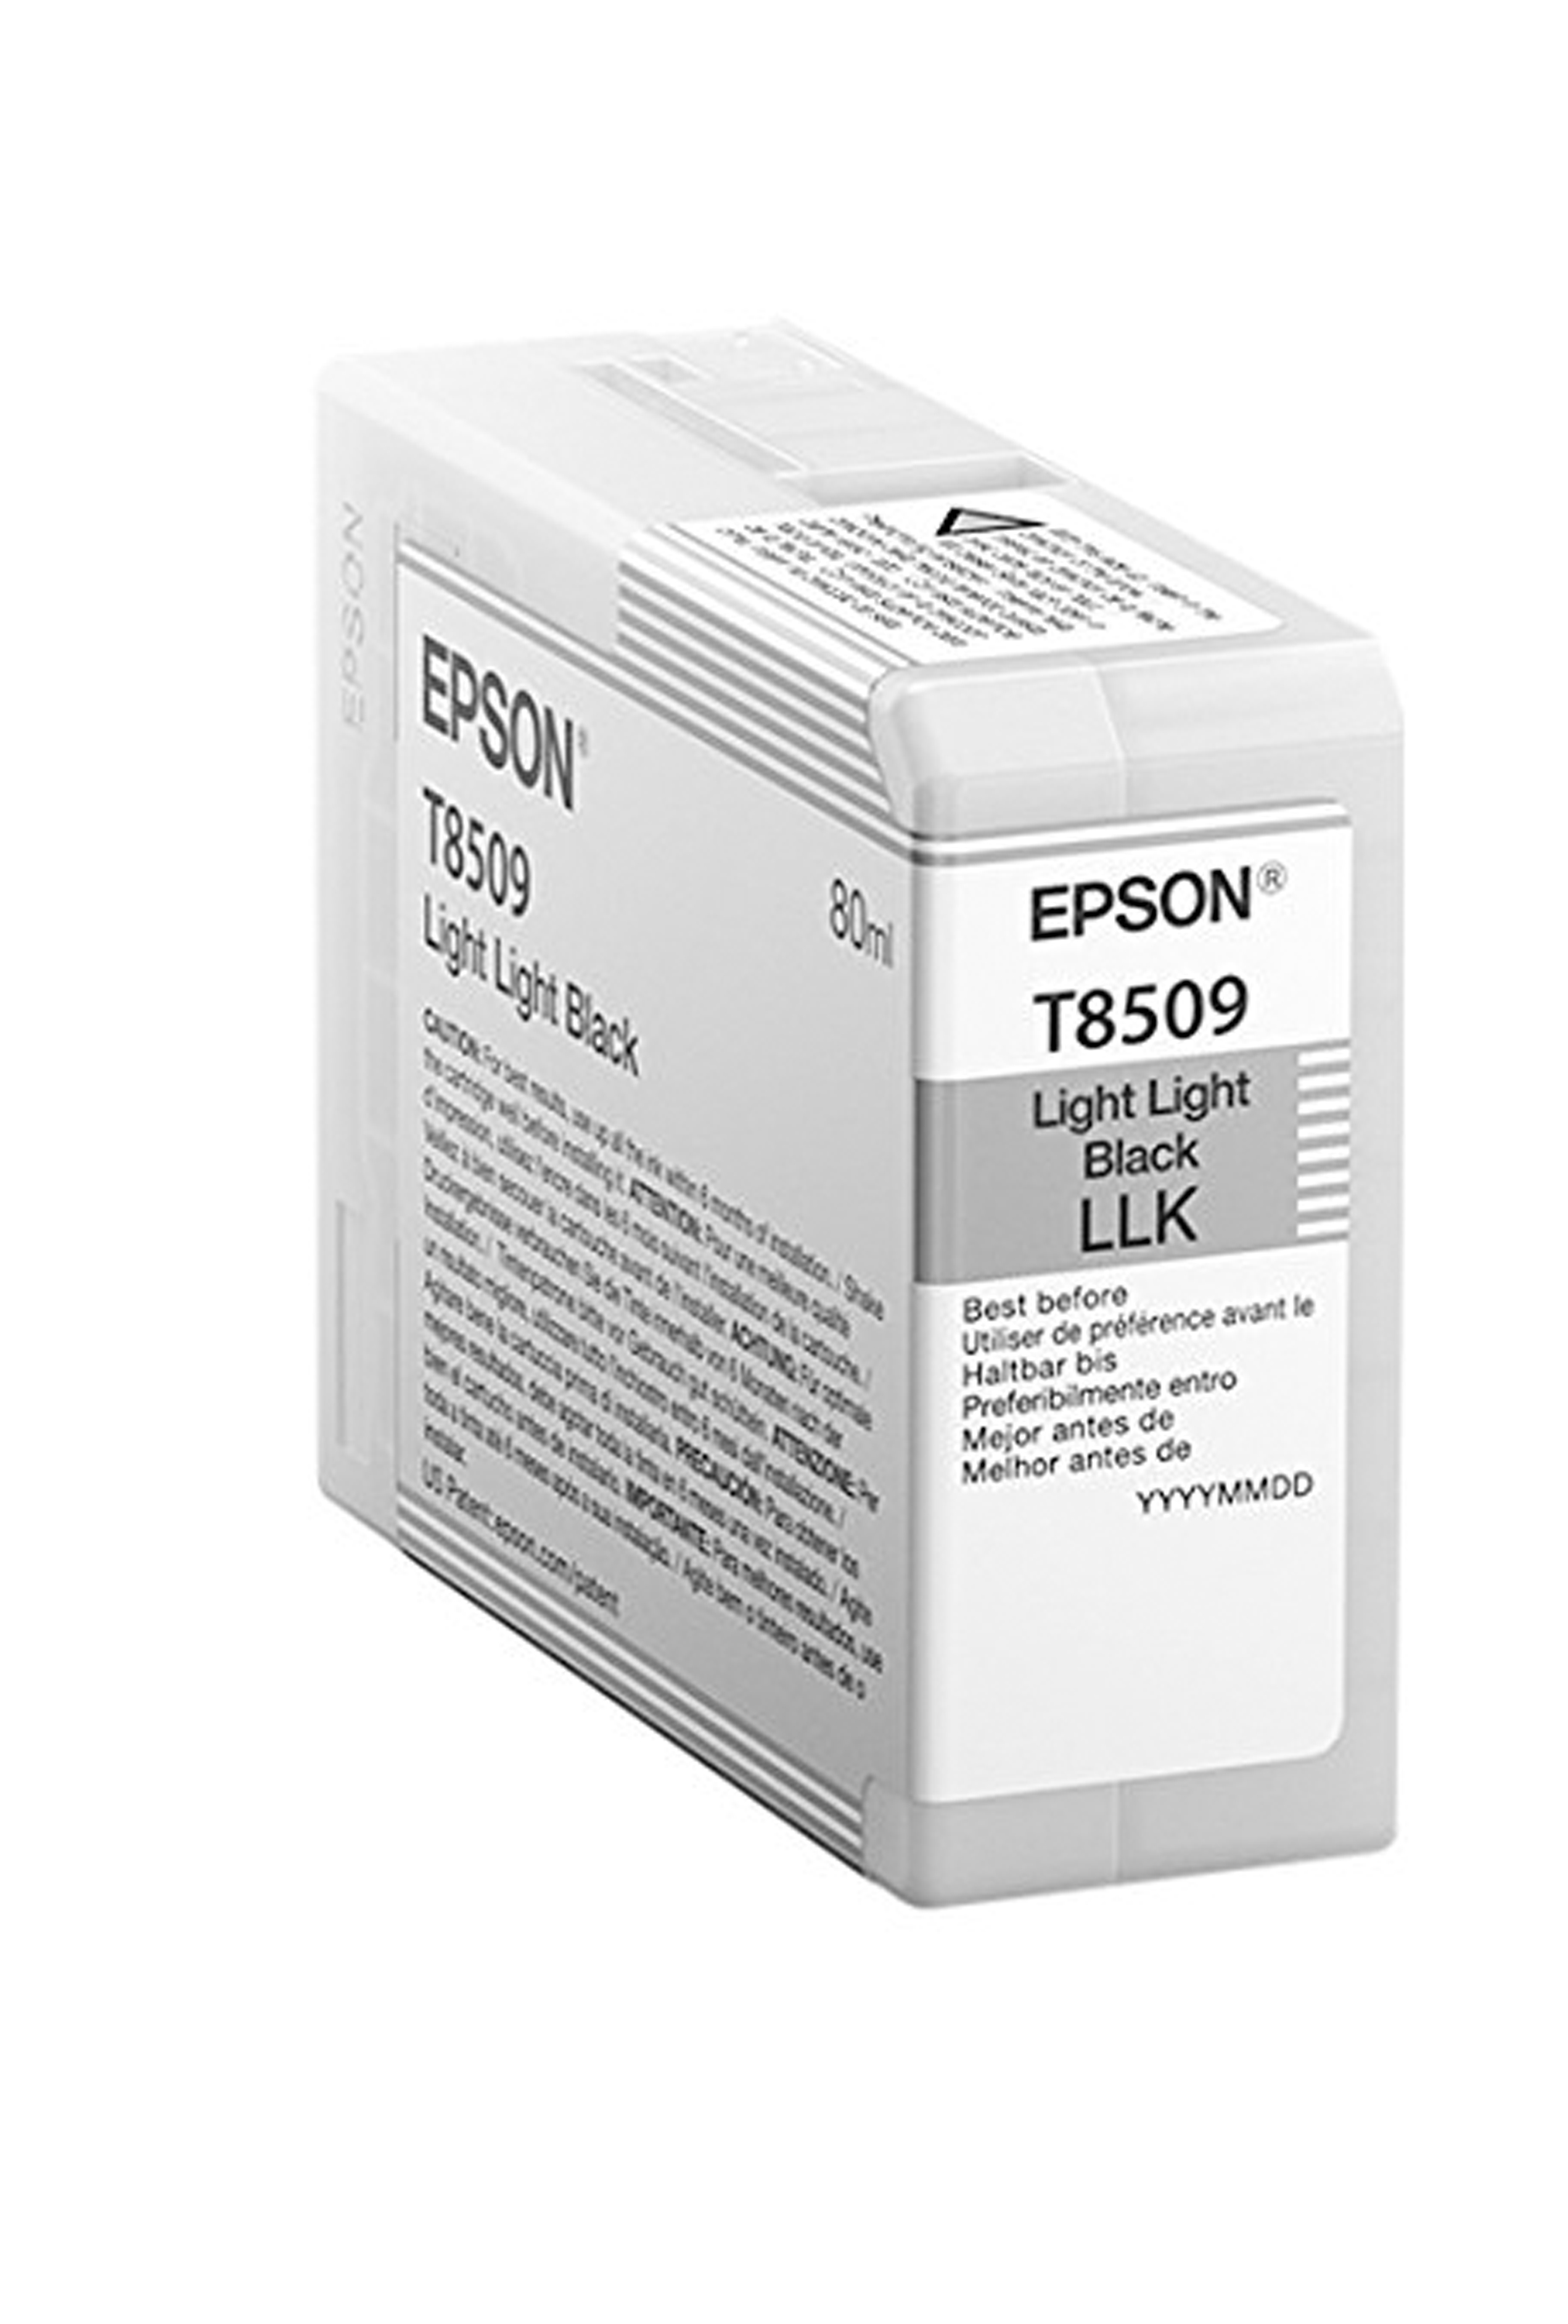 Epson EPSON SD LT BLACK INK (80 ML) (T850900)